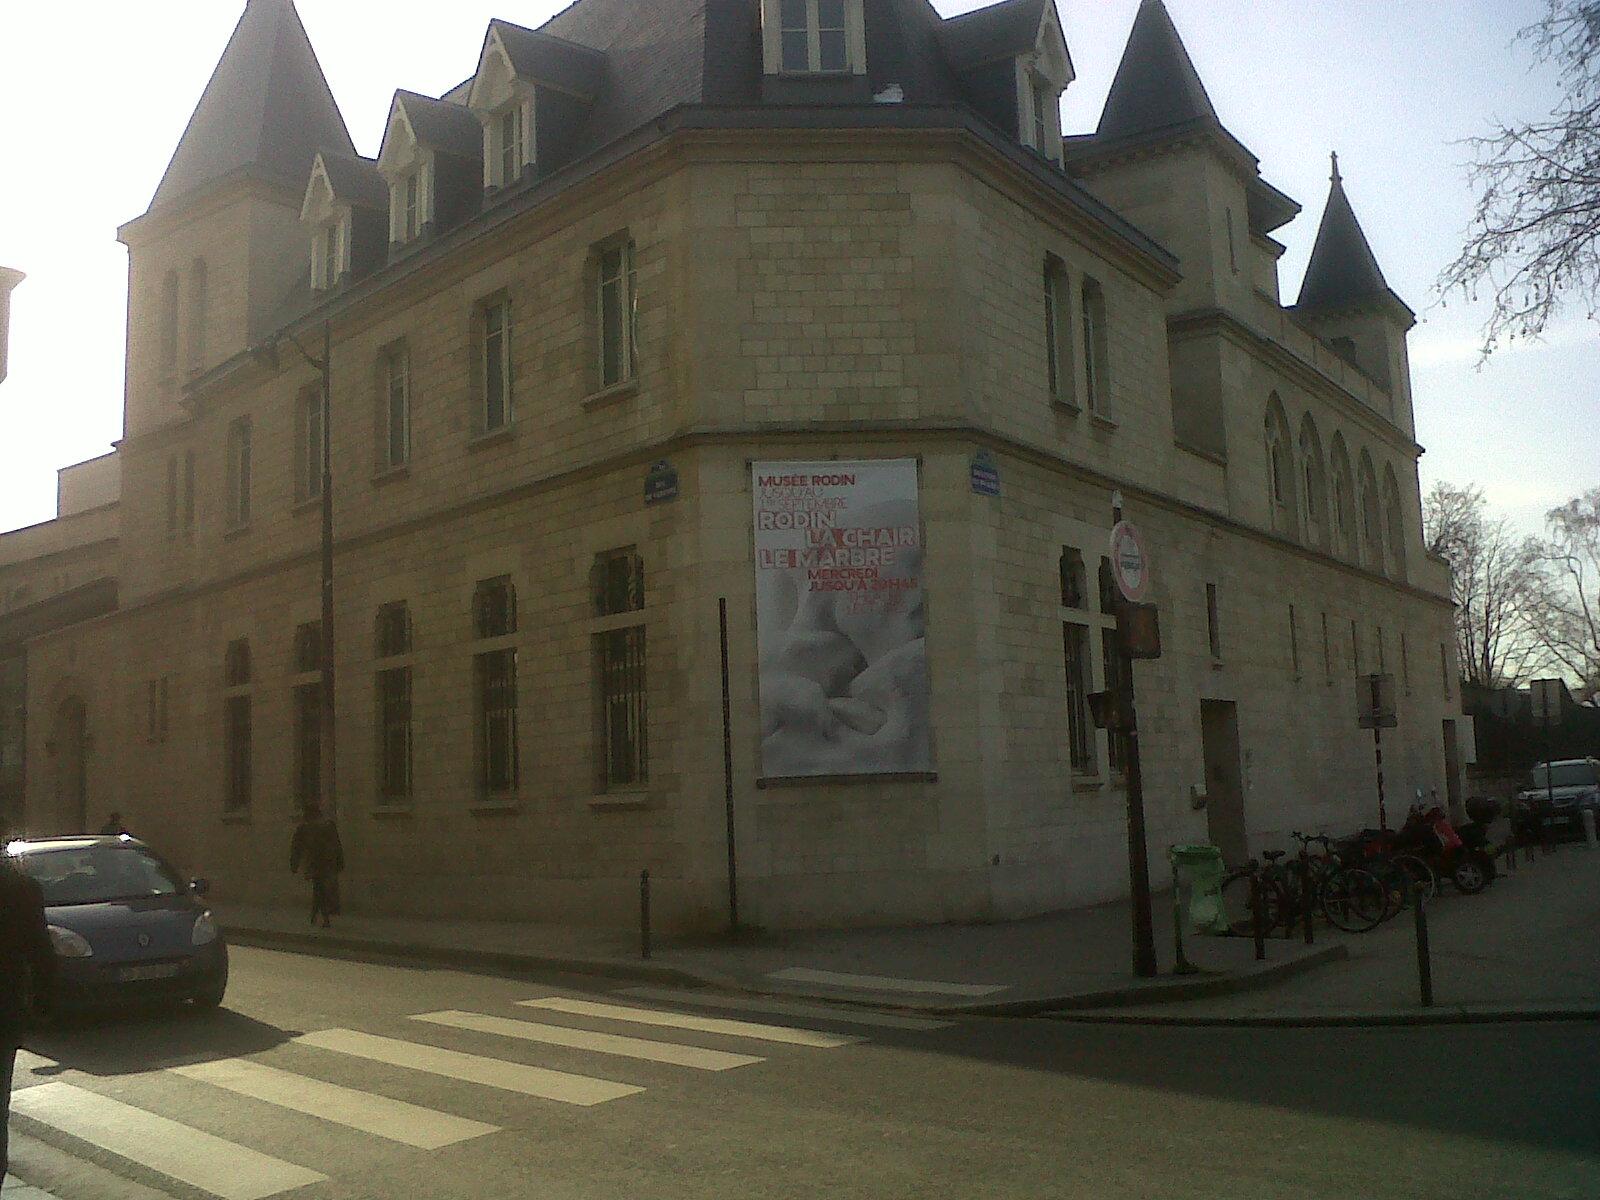 paris-mus-rodin-rue-varenne-mar13